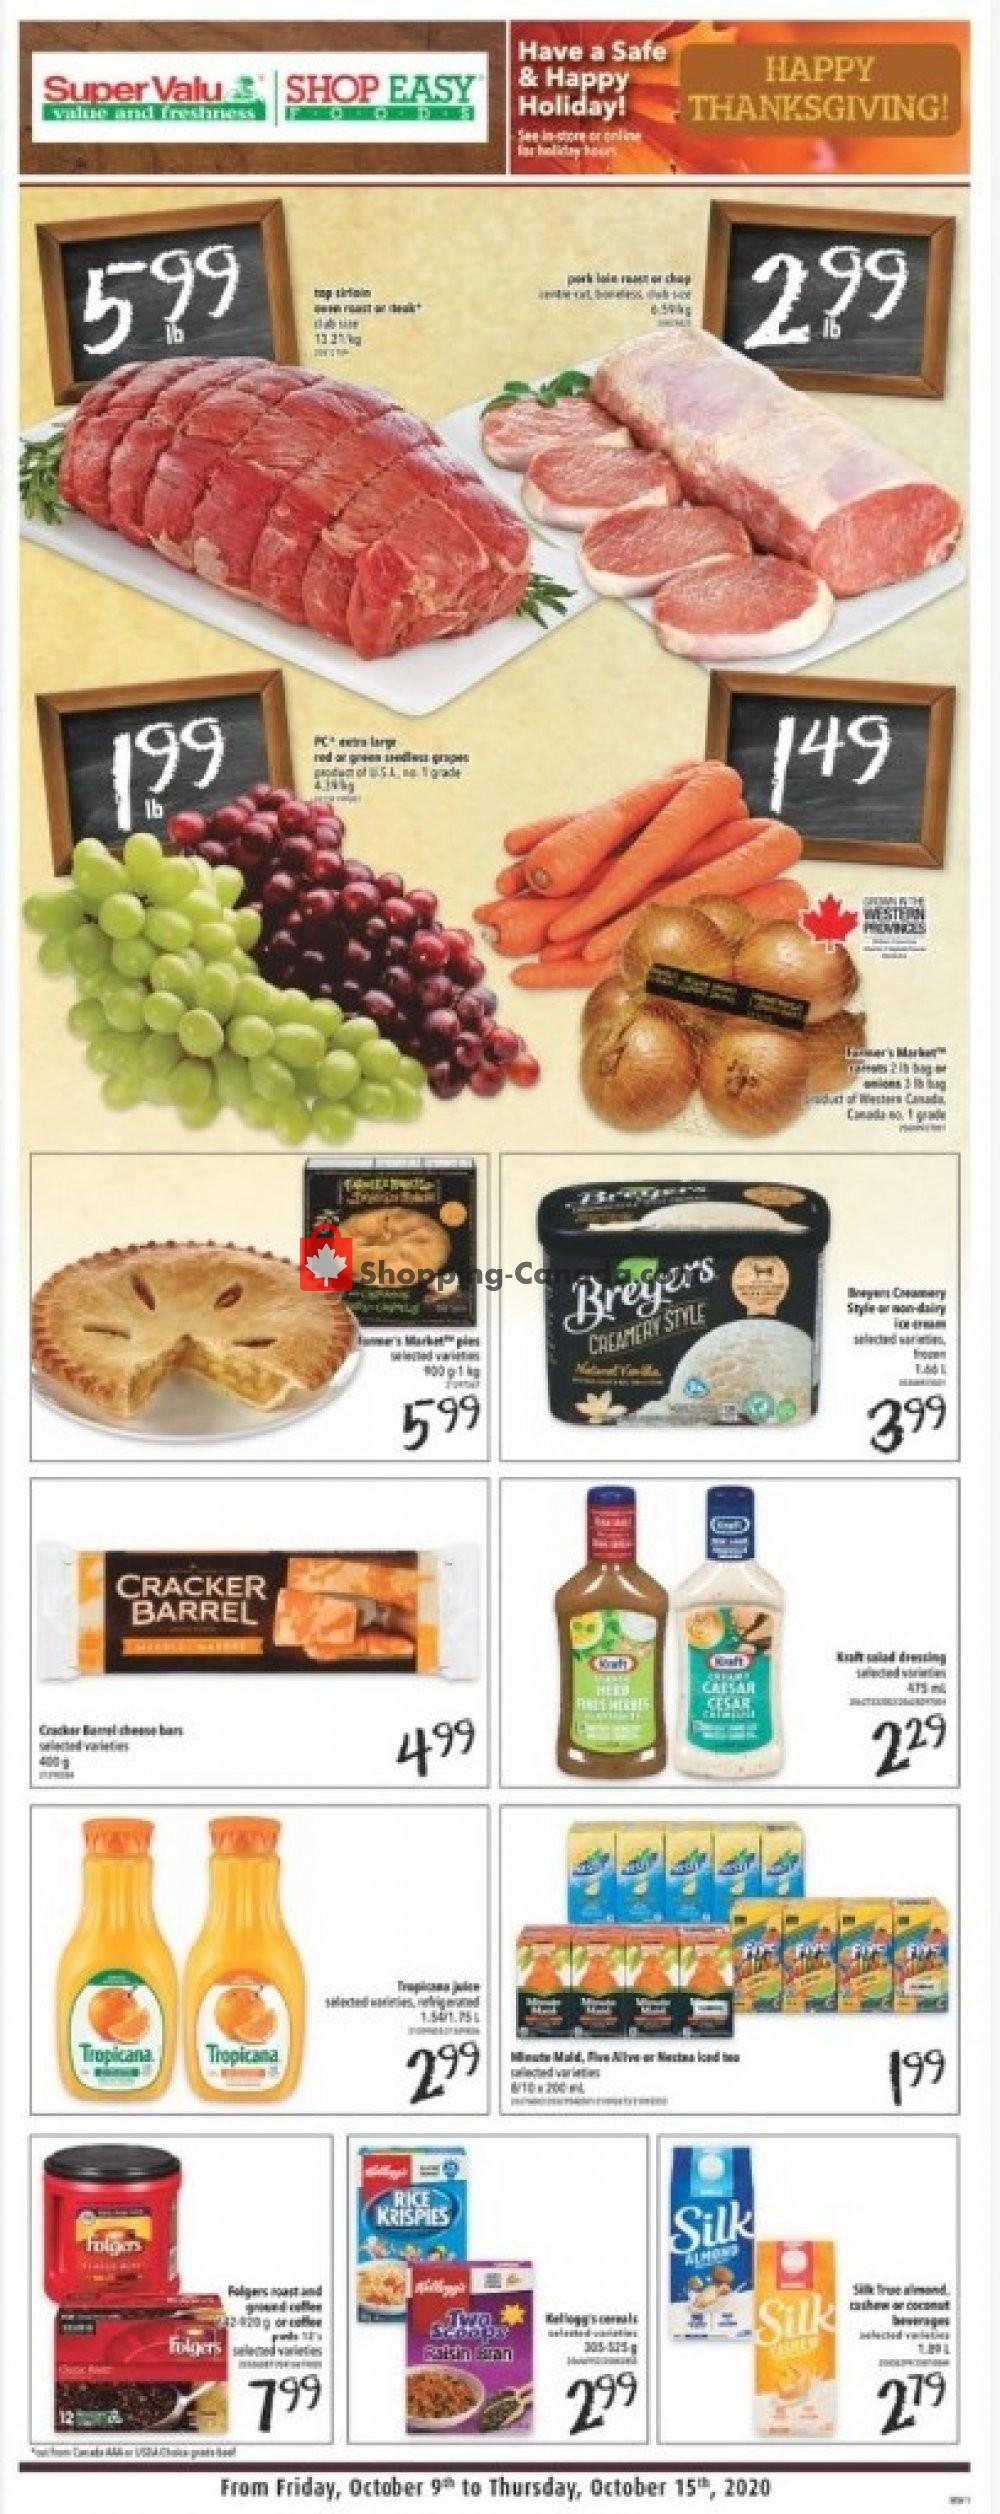 Flyer Shop Easy Foods & SuperValu Canada - from Friday October 9, 2020 to Thursday October 15, 2020